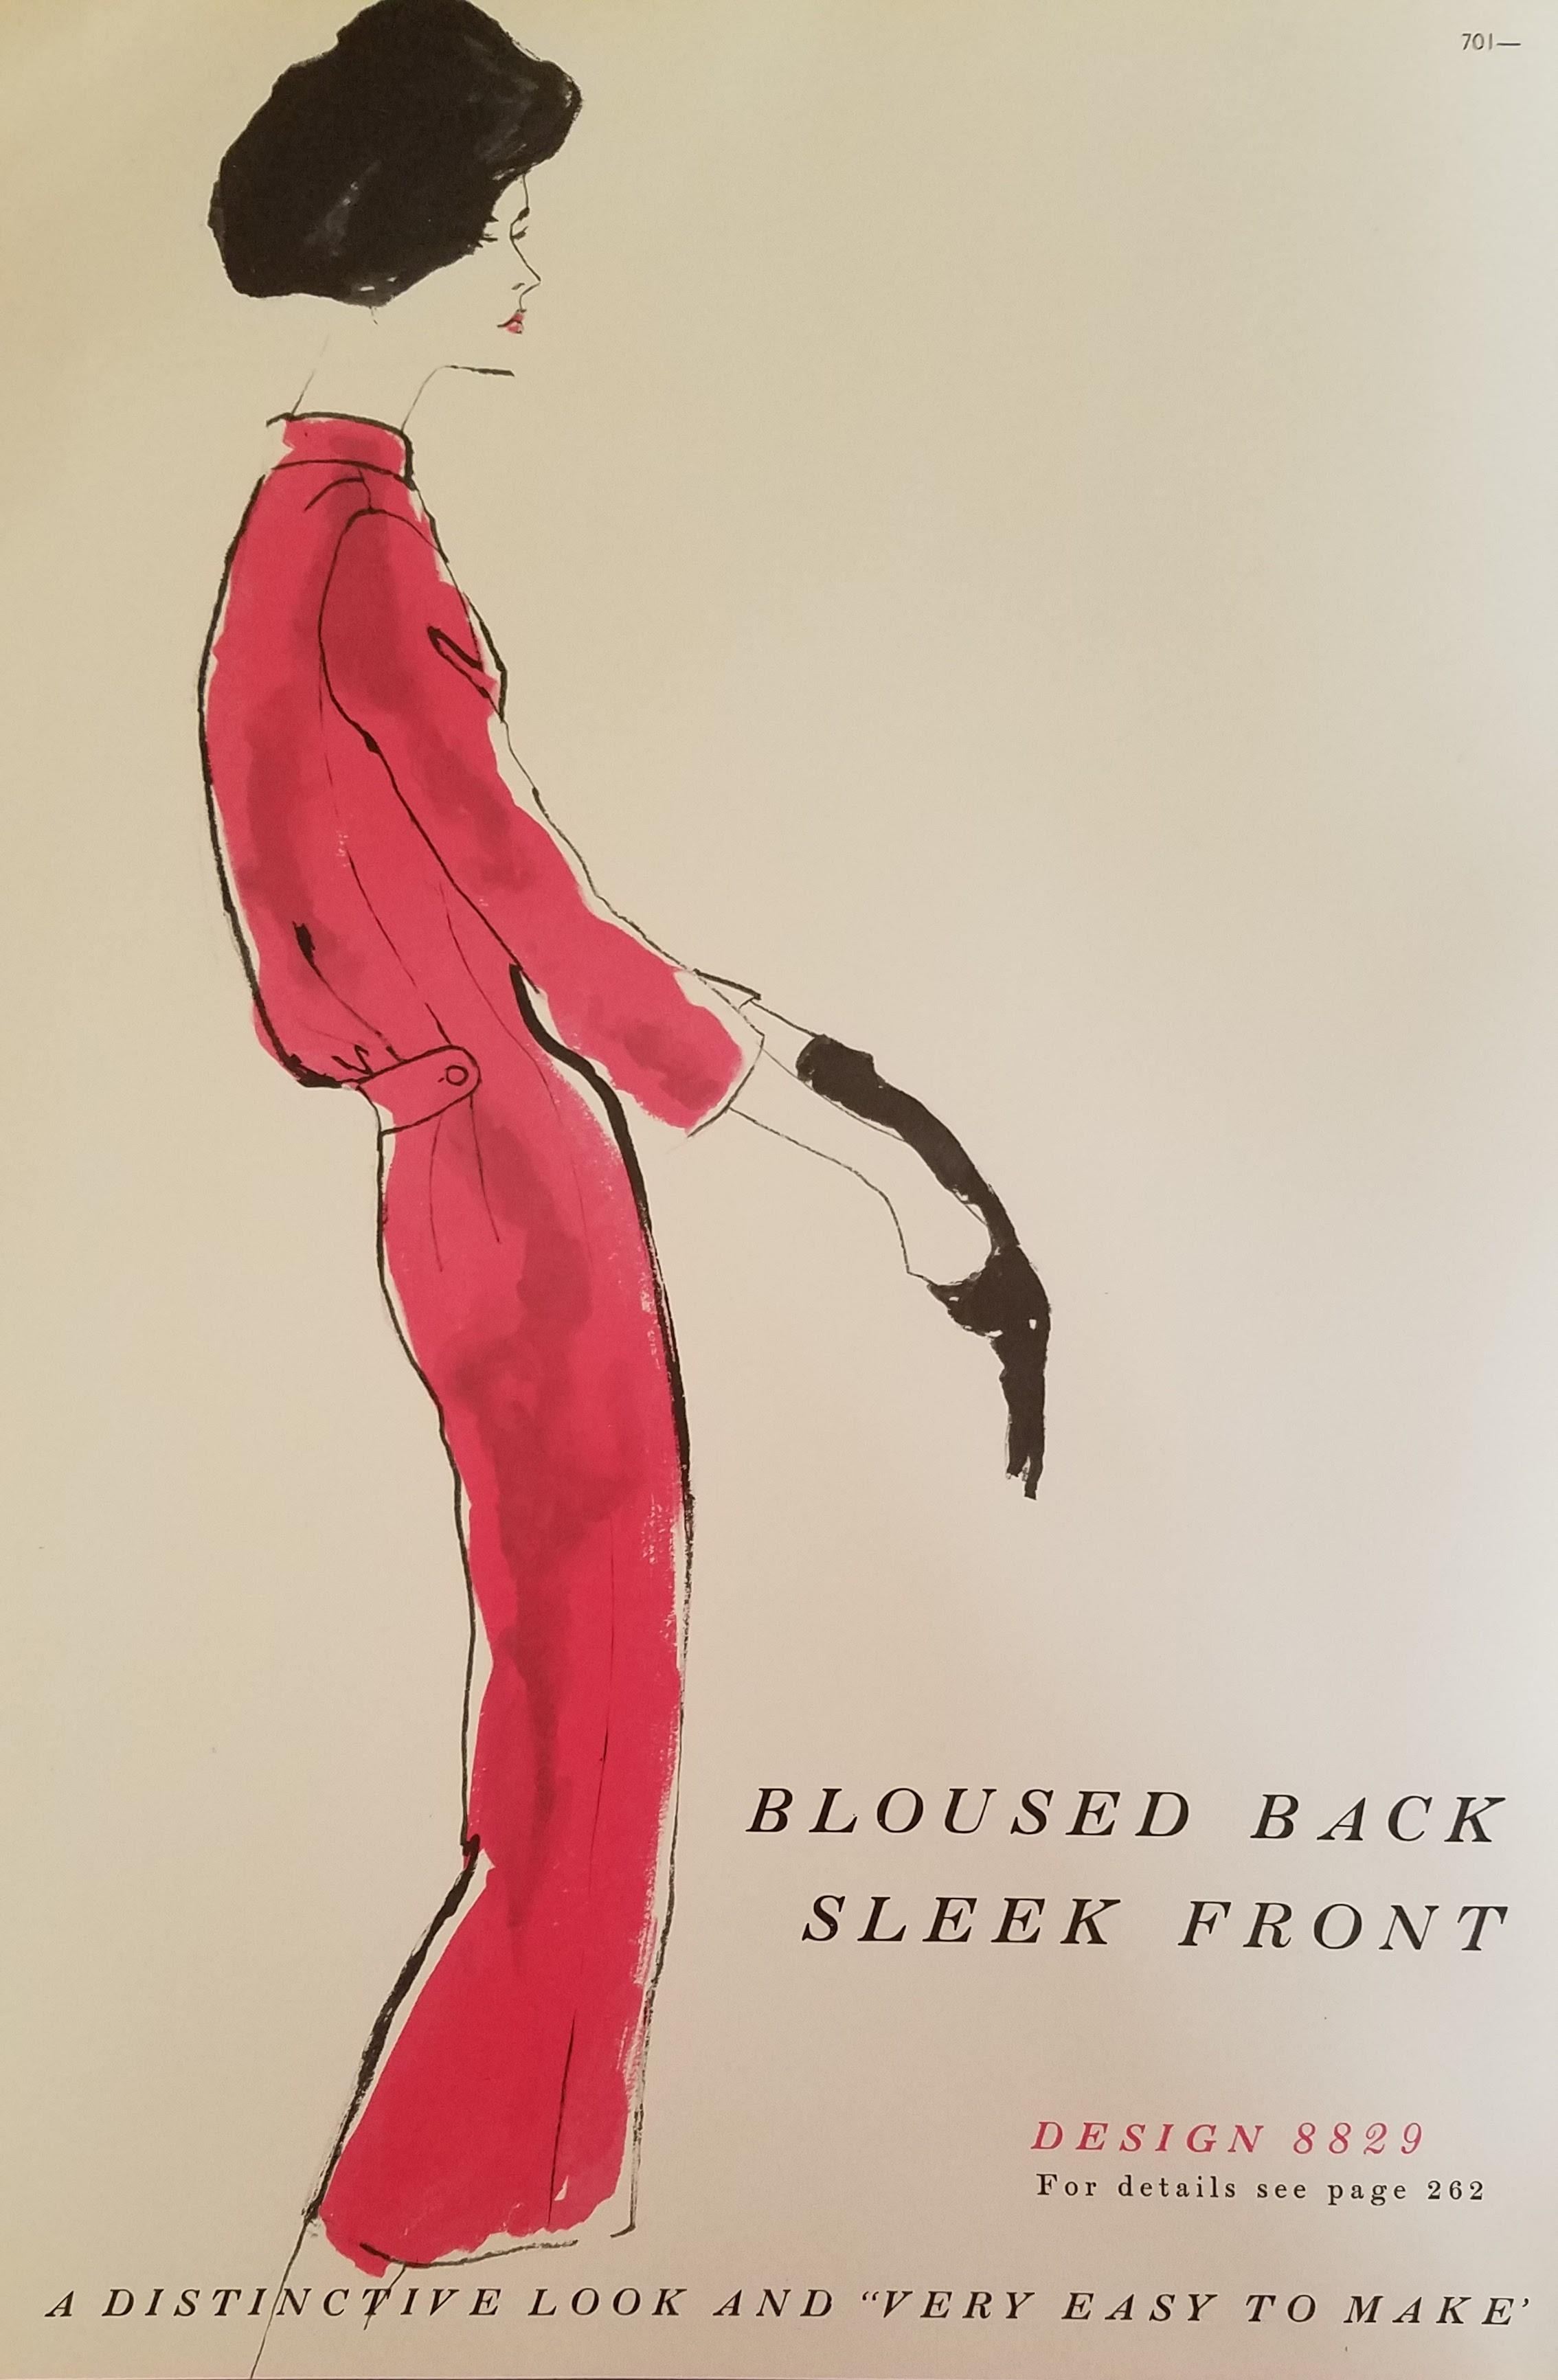 Bloused Back-Sleek front